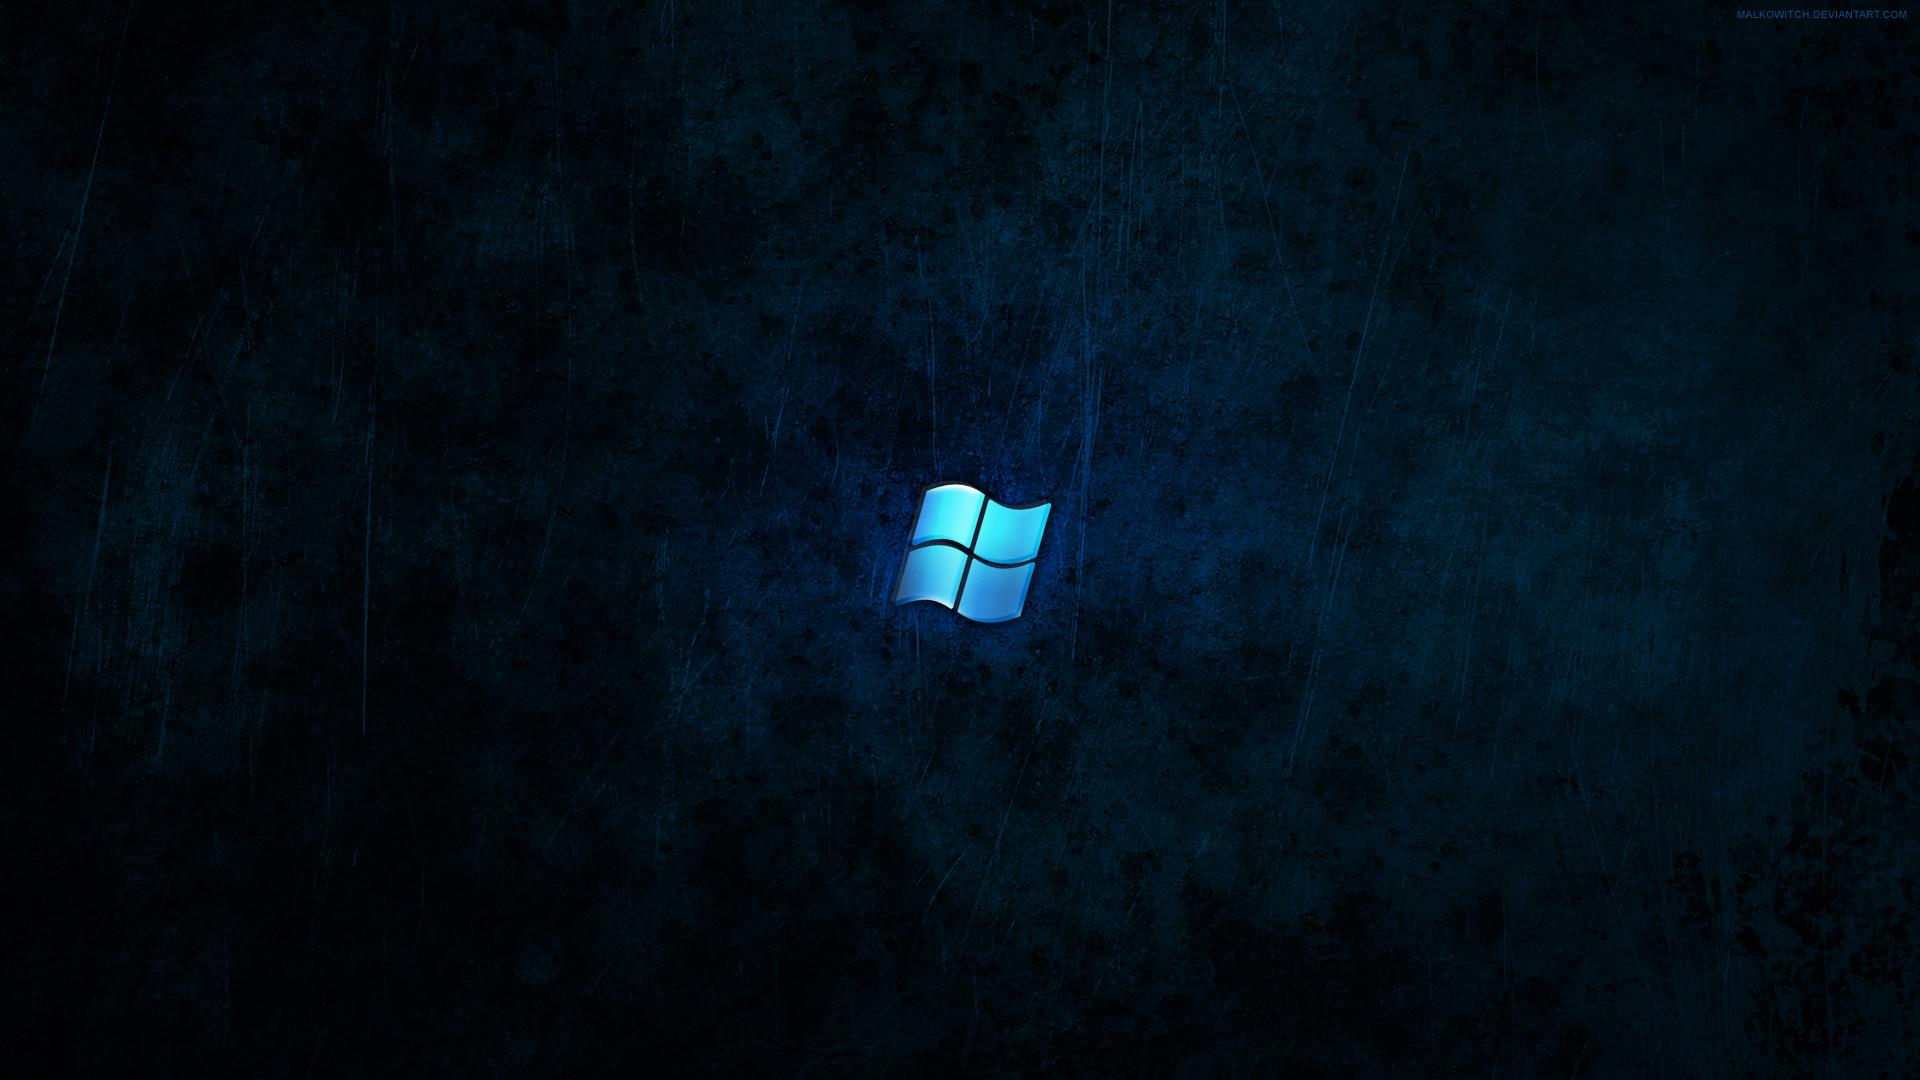 Windows Wallpaper wallpaper – 595110